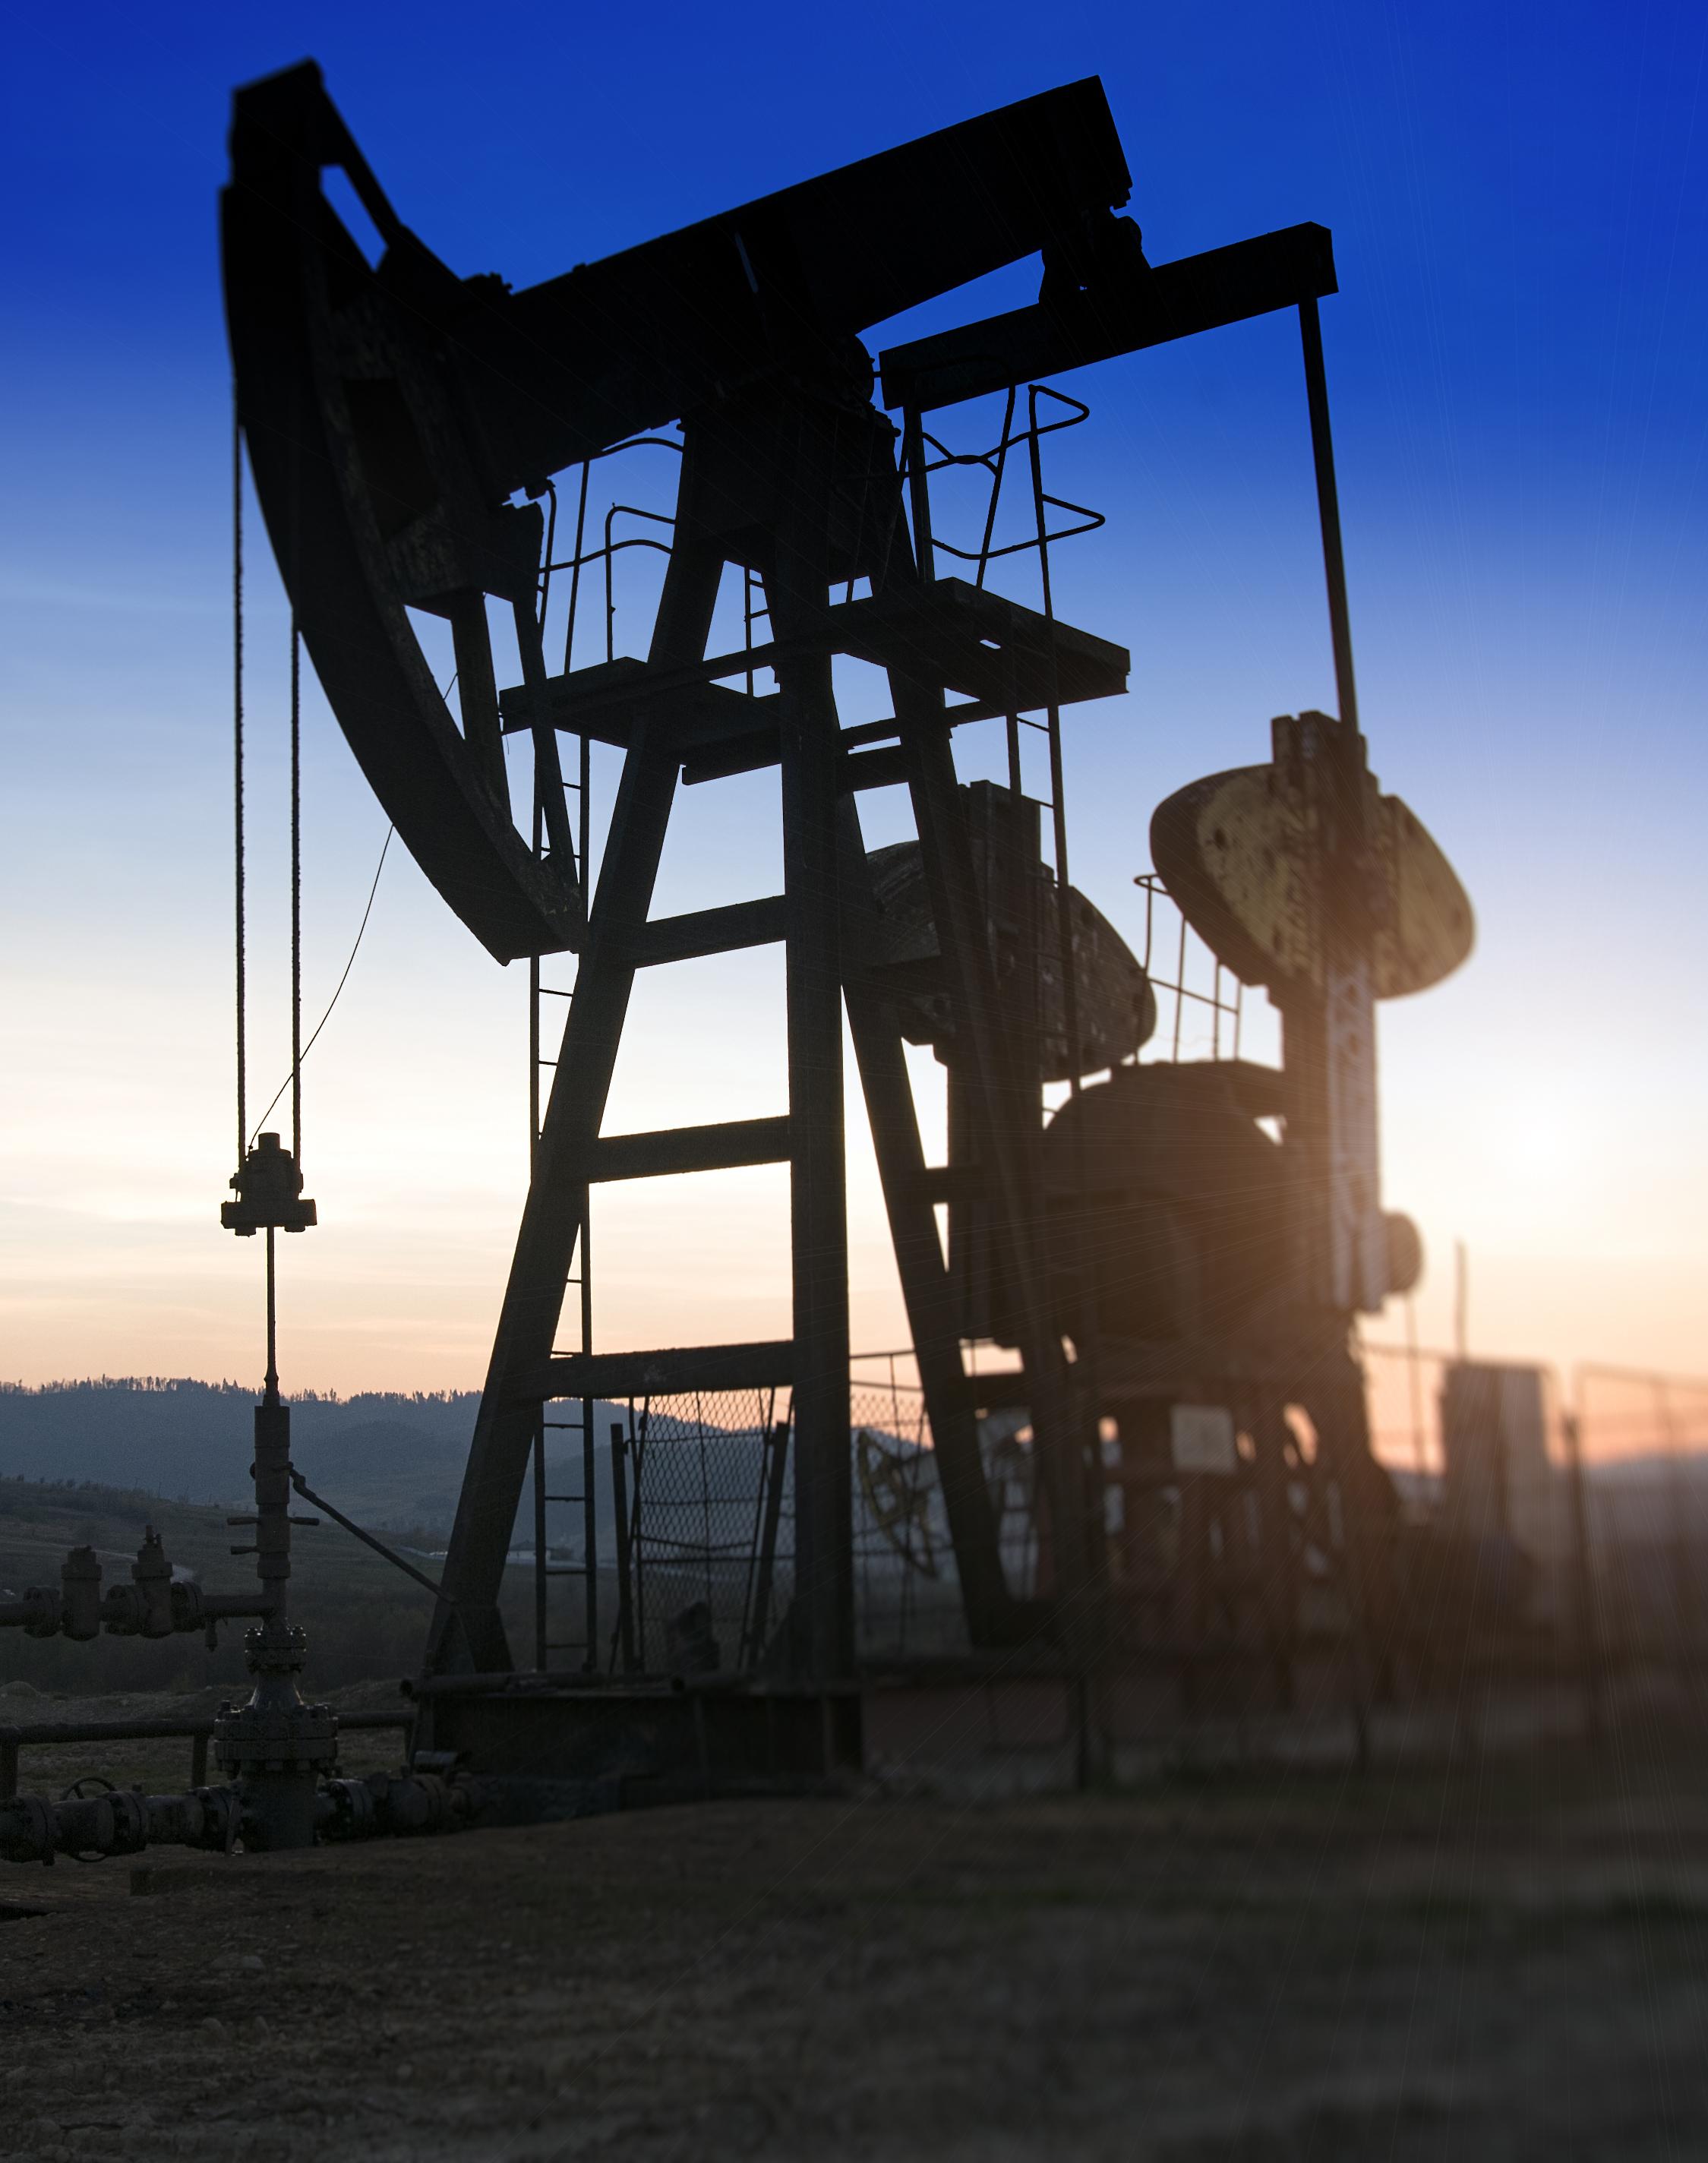 oil-pump-on-sunset-XLJQDR4.jpg